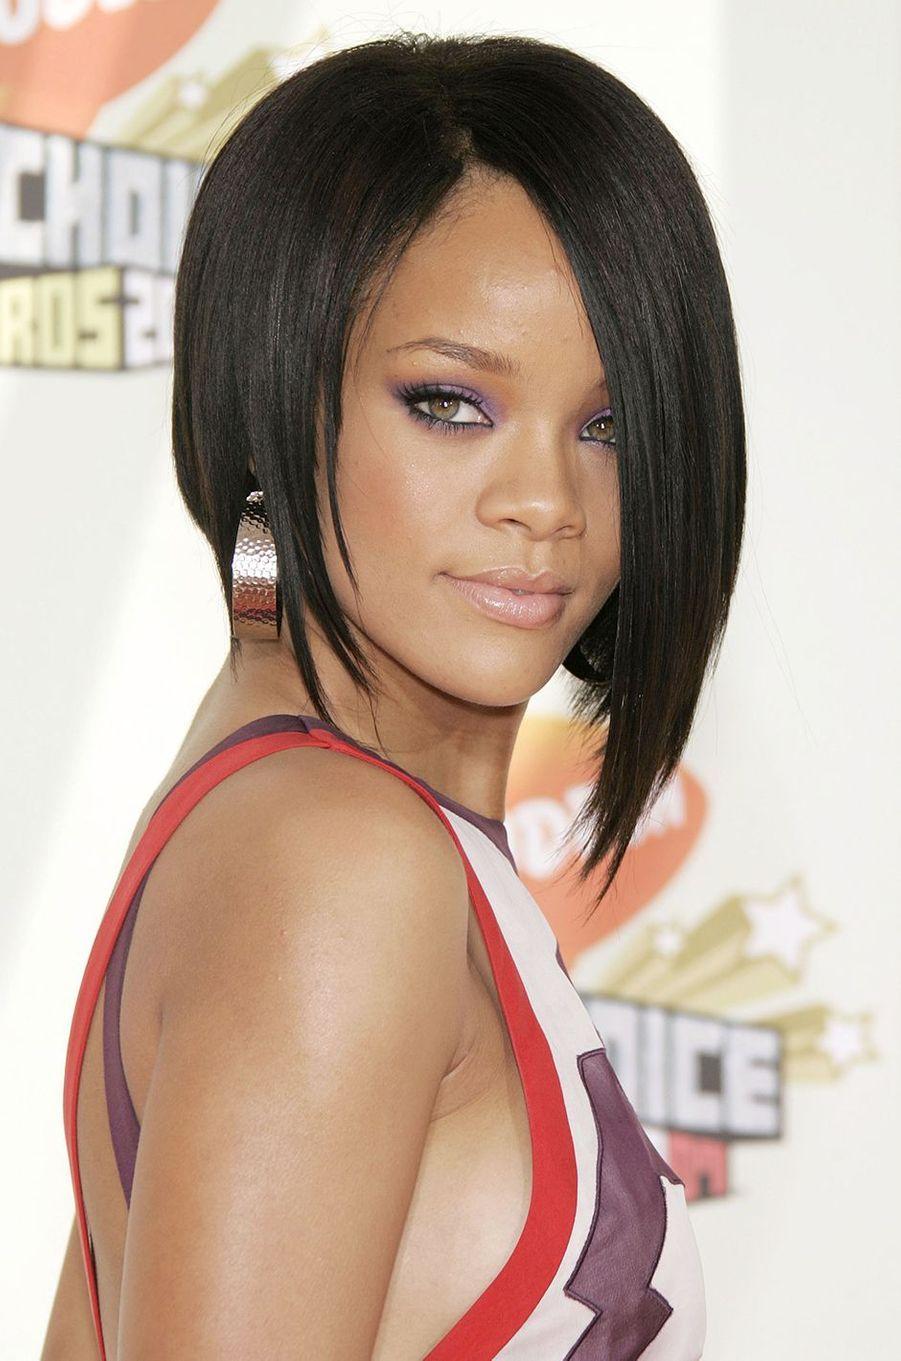 Rihanna lors desKids' Choice Awards à Los Angeles en mars 2007